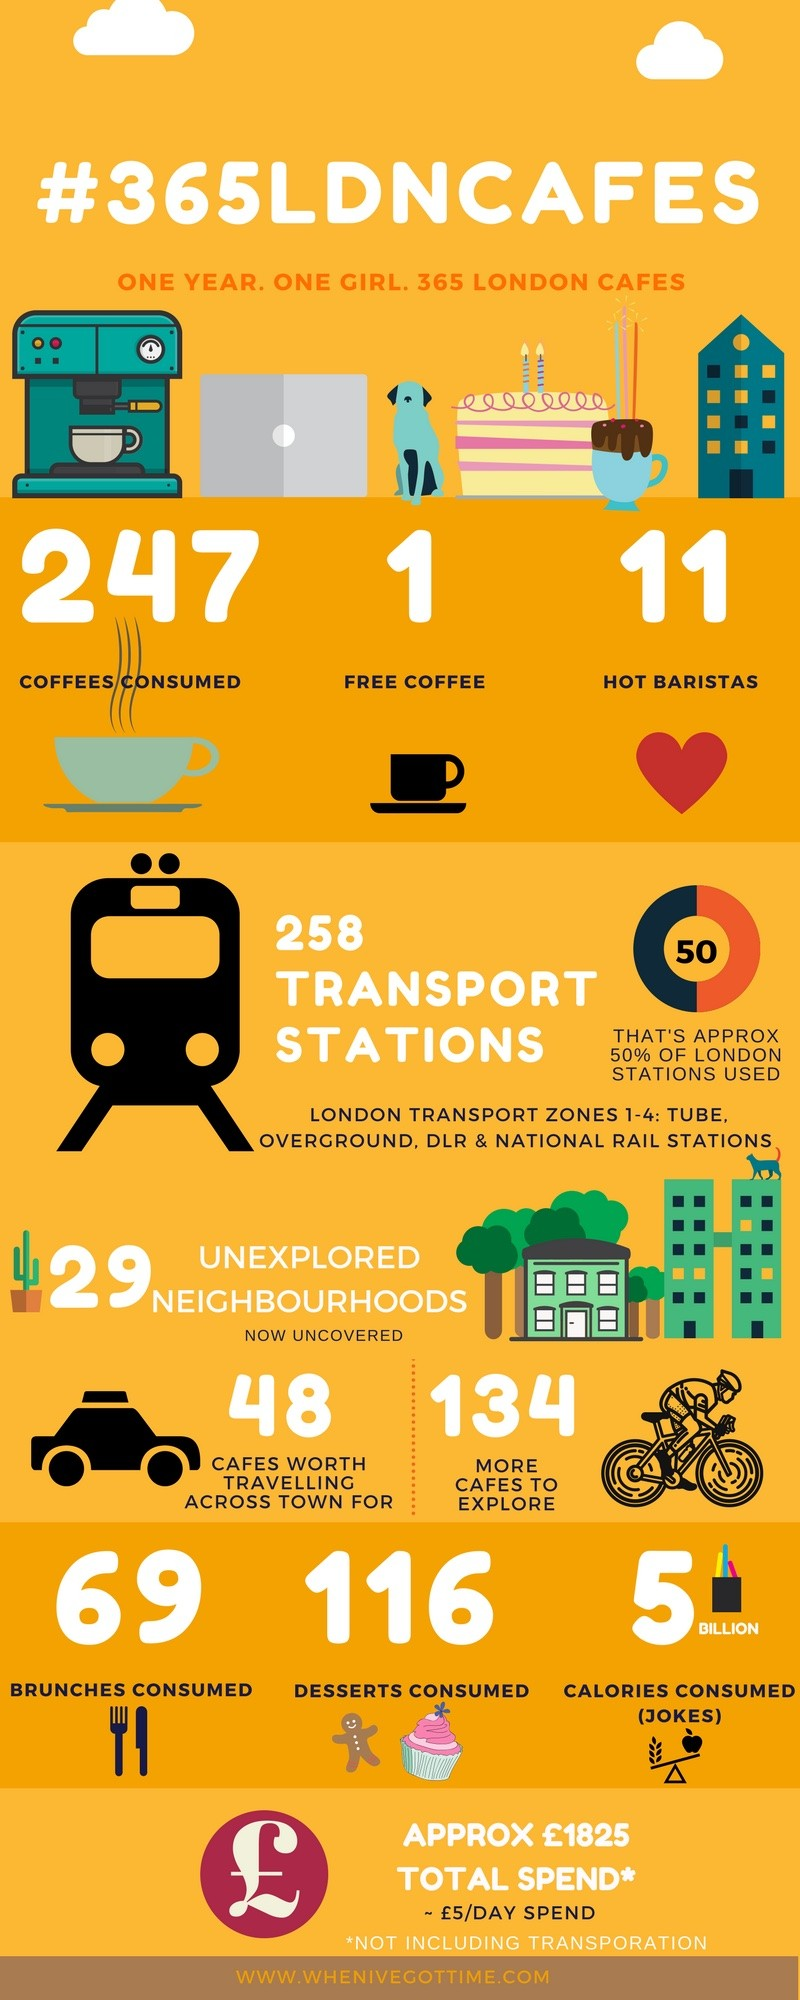 #365LDNCafes - 365 London Cafes in 365 Days By Alexandra Kalinowski